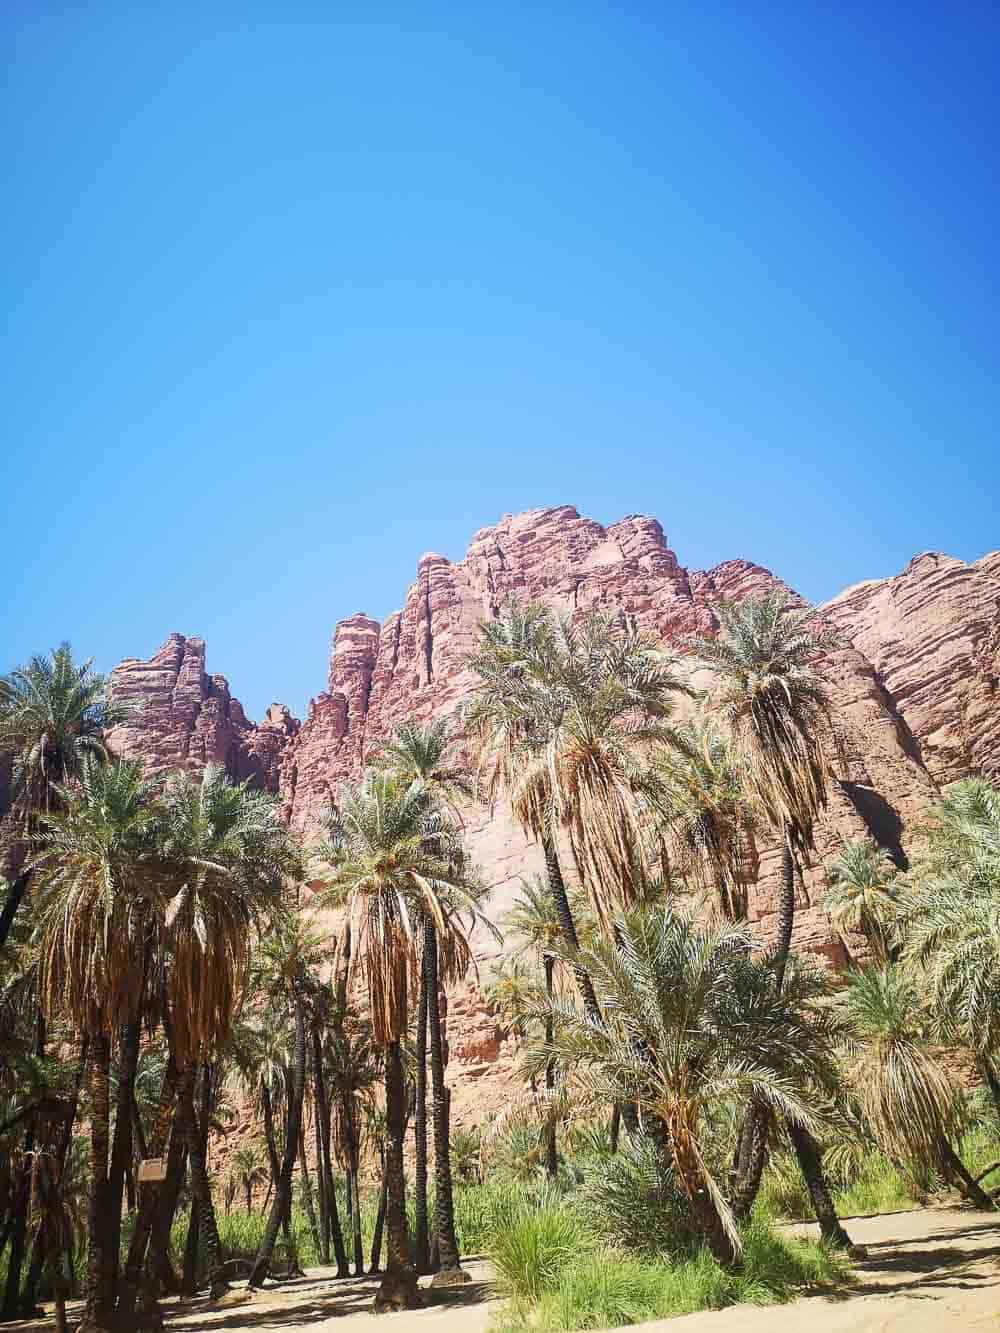 Wadi Dissah in Saudi Arabia